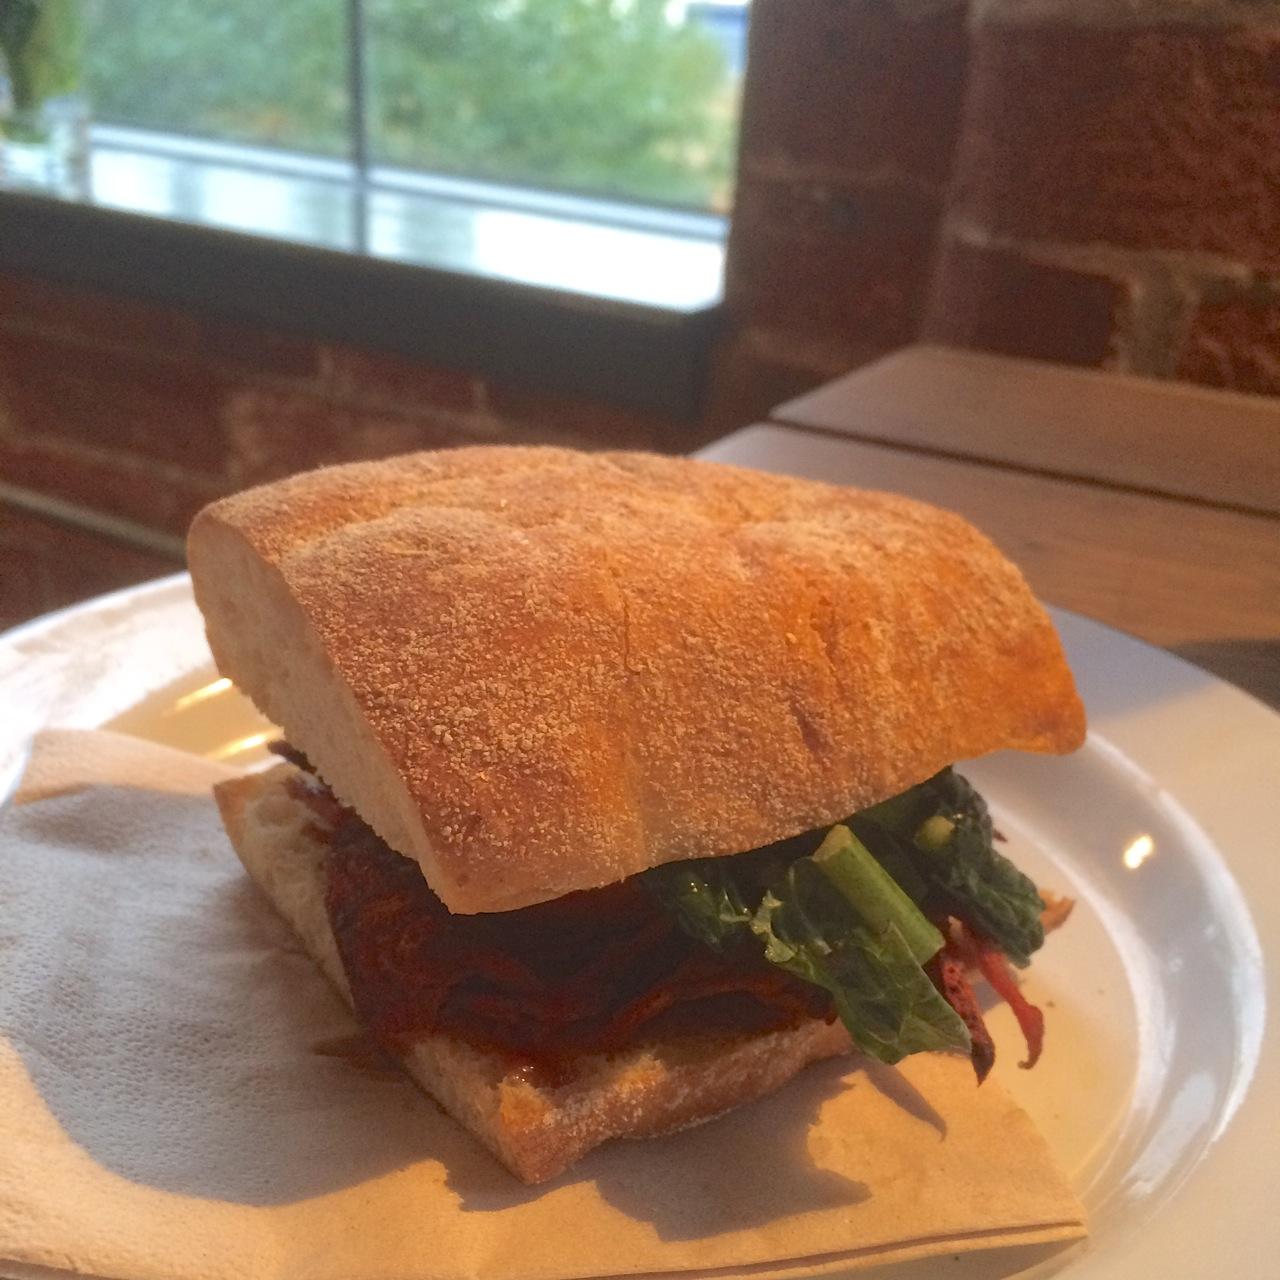 https://i0.wp.com/fatgayvegan.com/wp-content/uploads/2015/11/Sandwich-vegan.jpg?fit=1280%2C1280